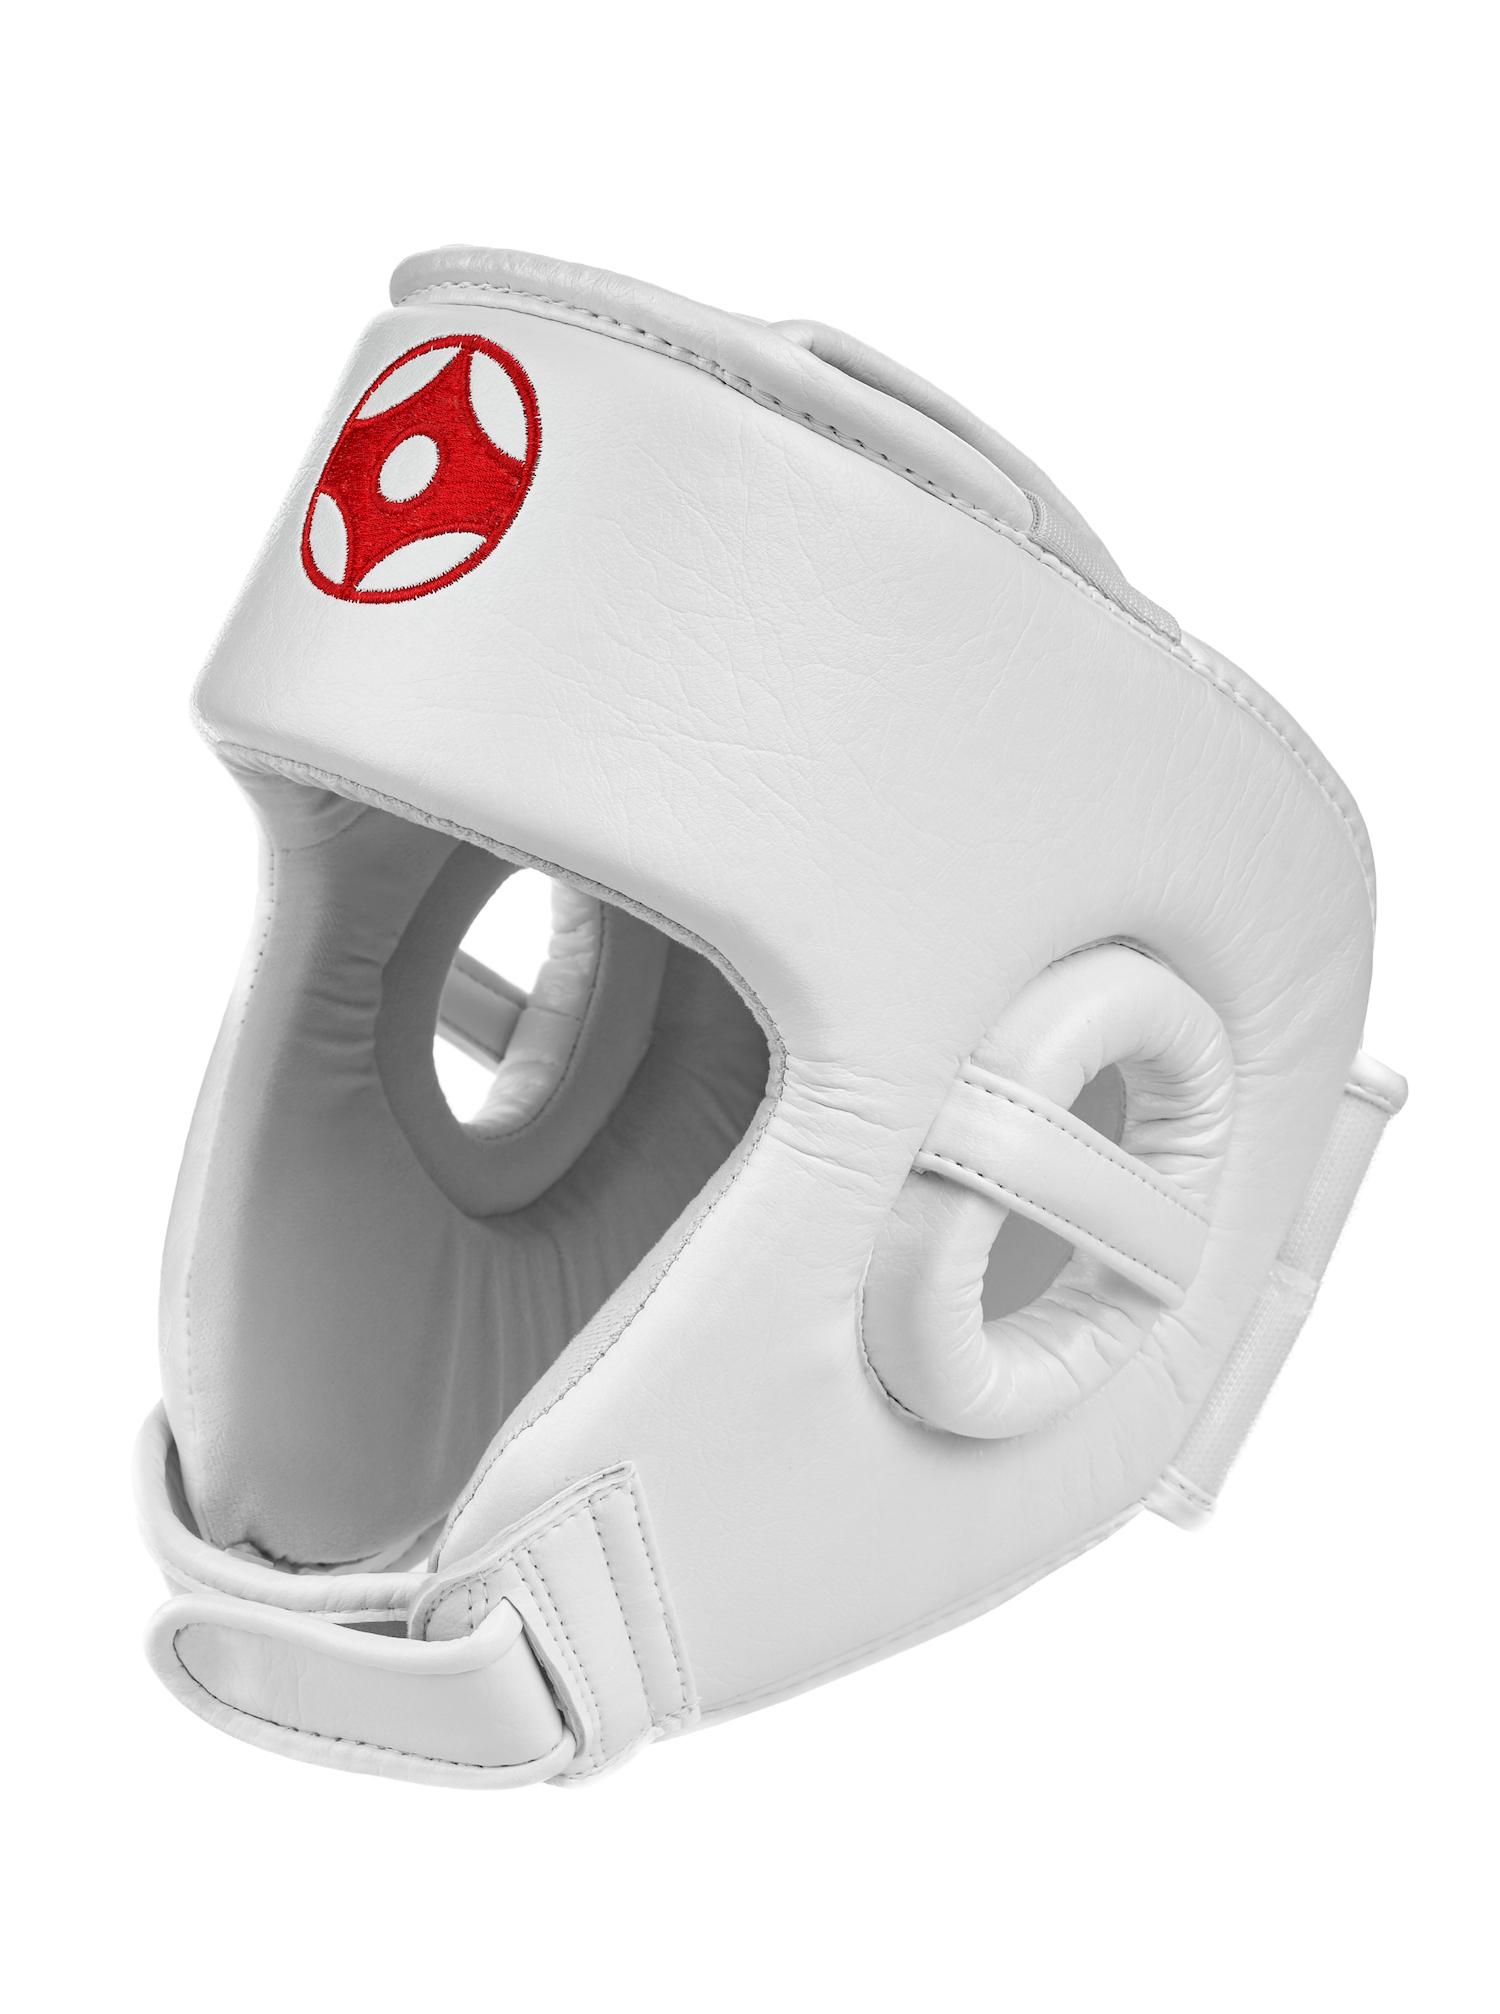 Шлемы Шлем BFS - KYOKUSHINKAI Открытый / Medium IP-17.jpg